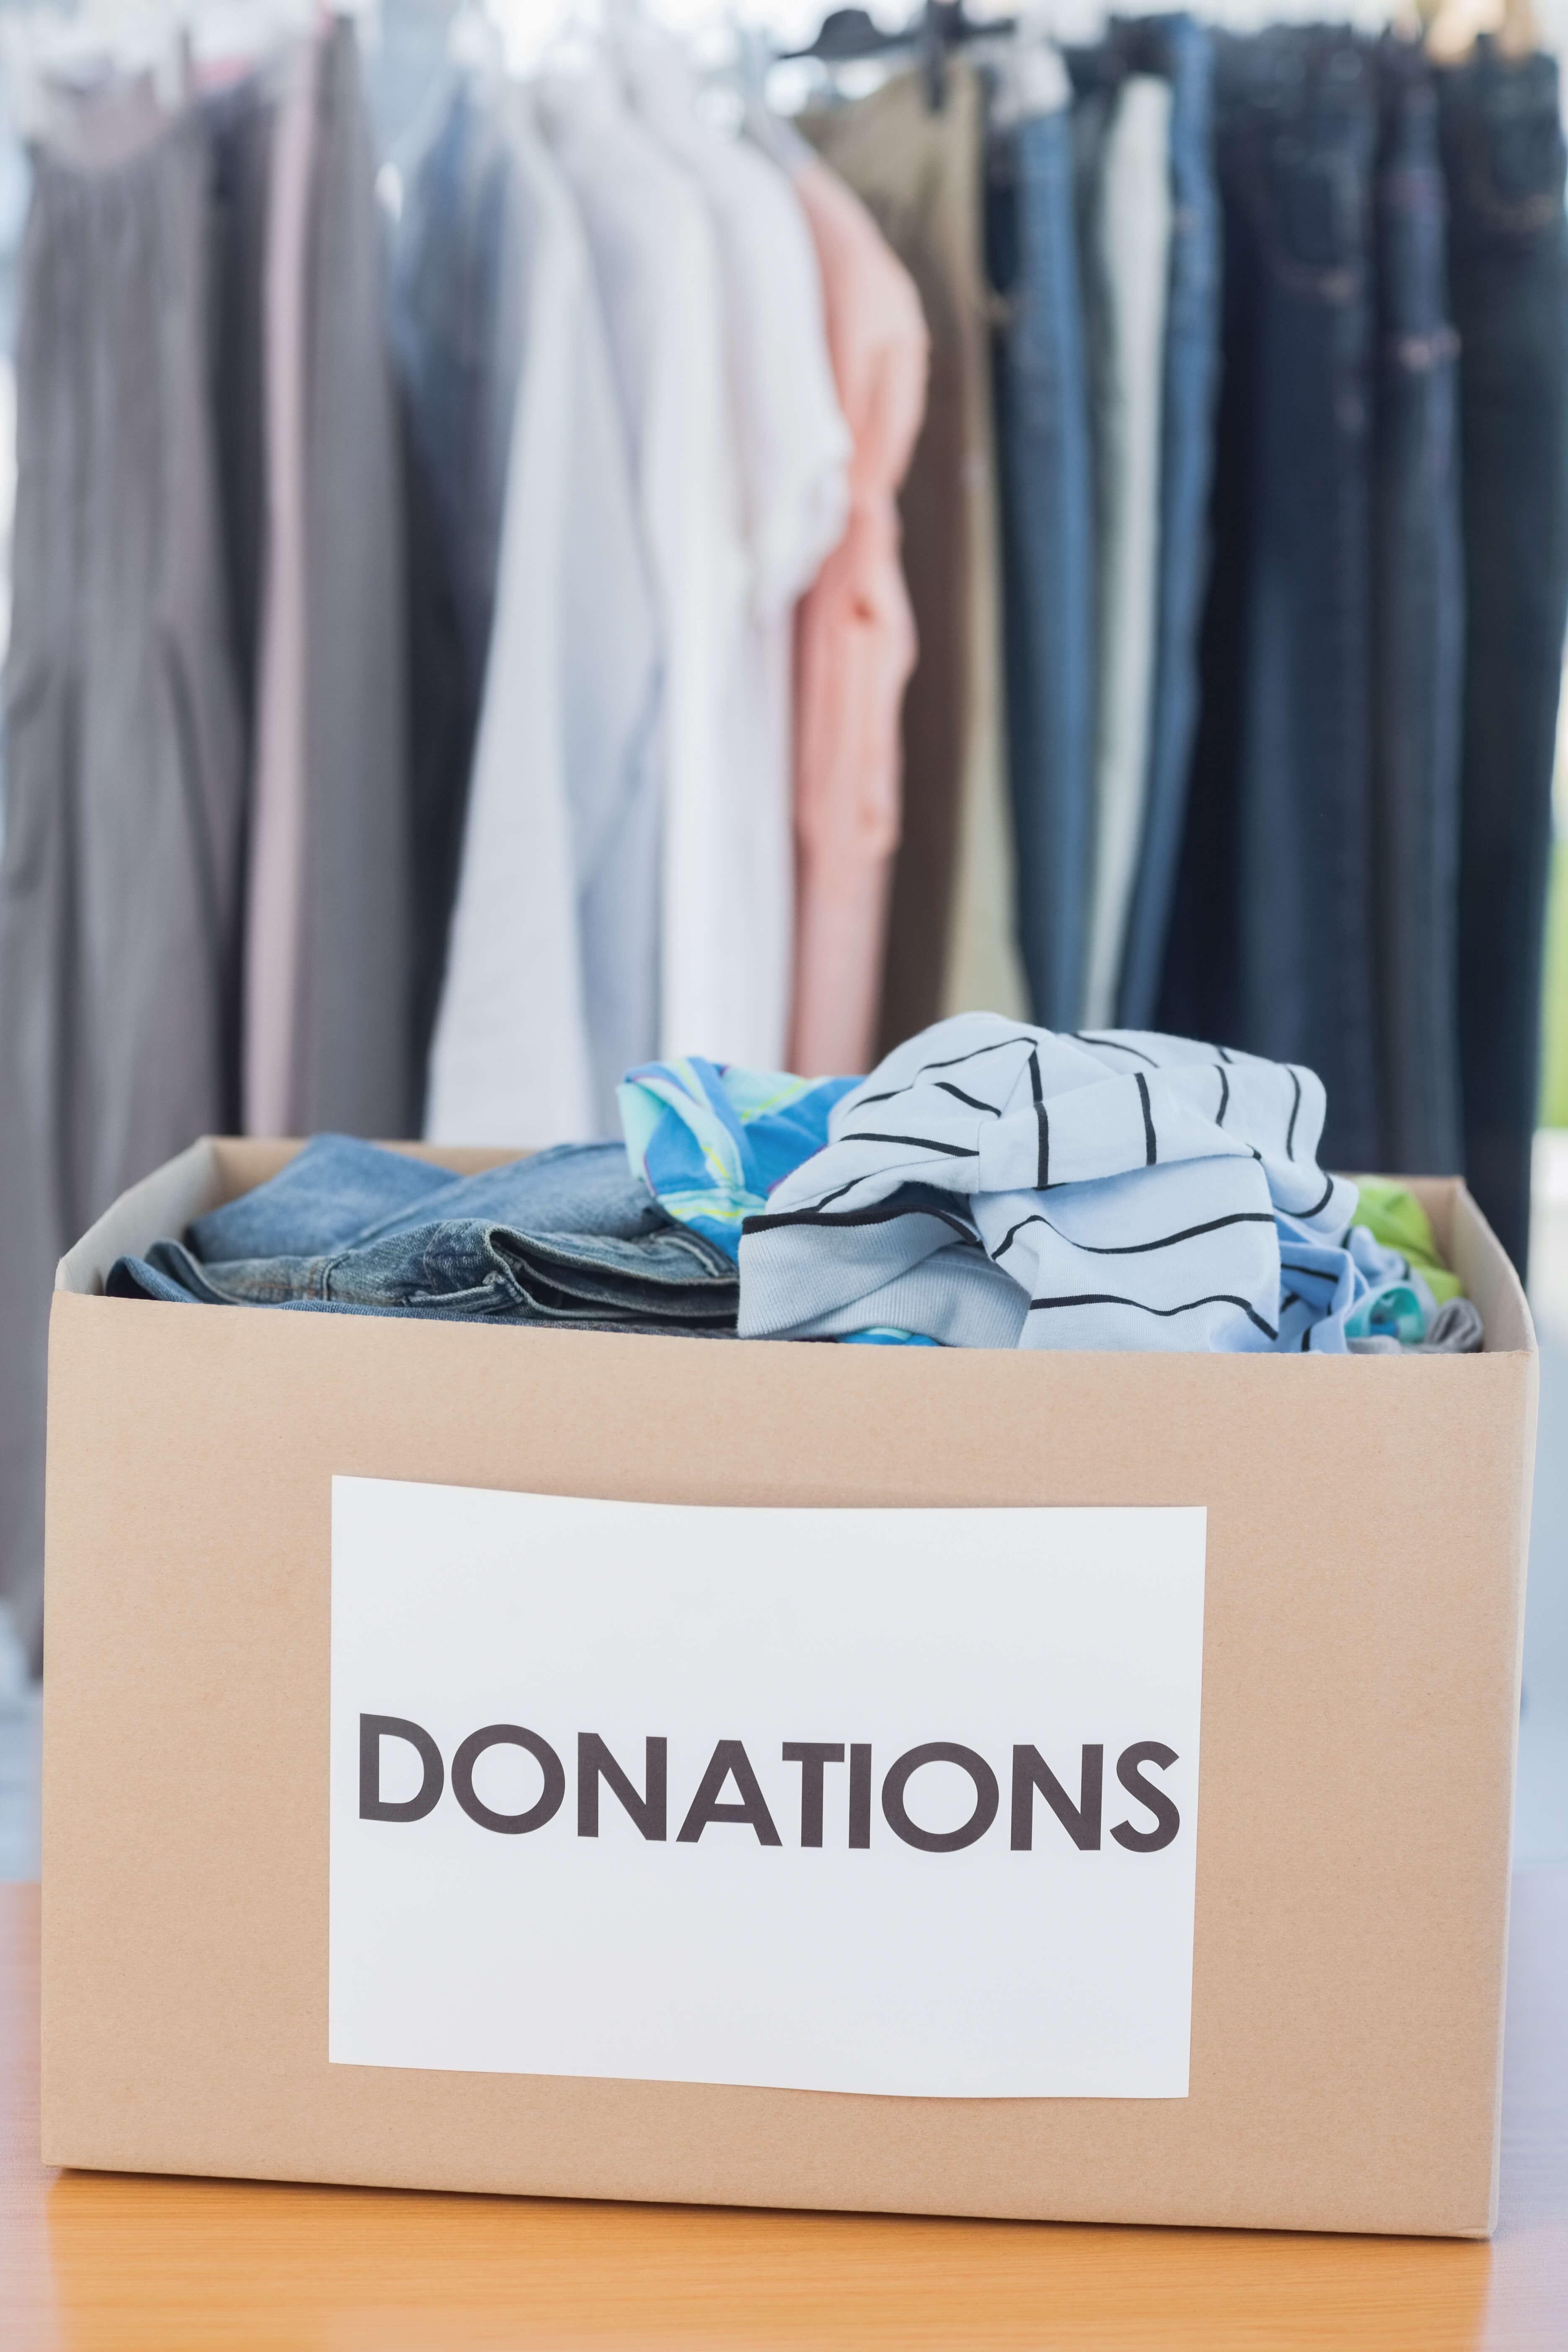 Deducting Charitable Donations